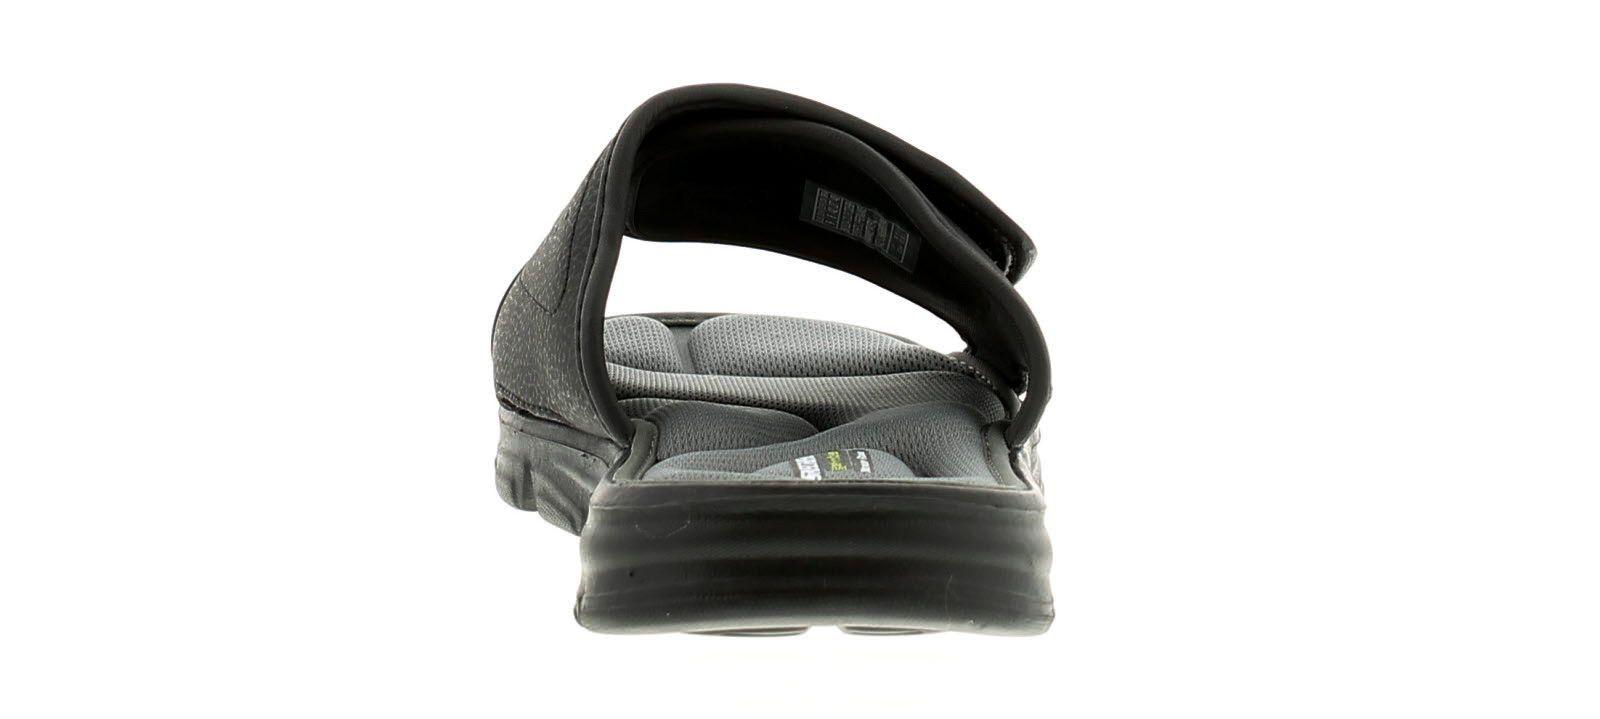 Skechers Wind Swell Men's Beach Sandals in Black